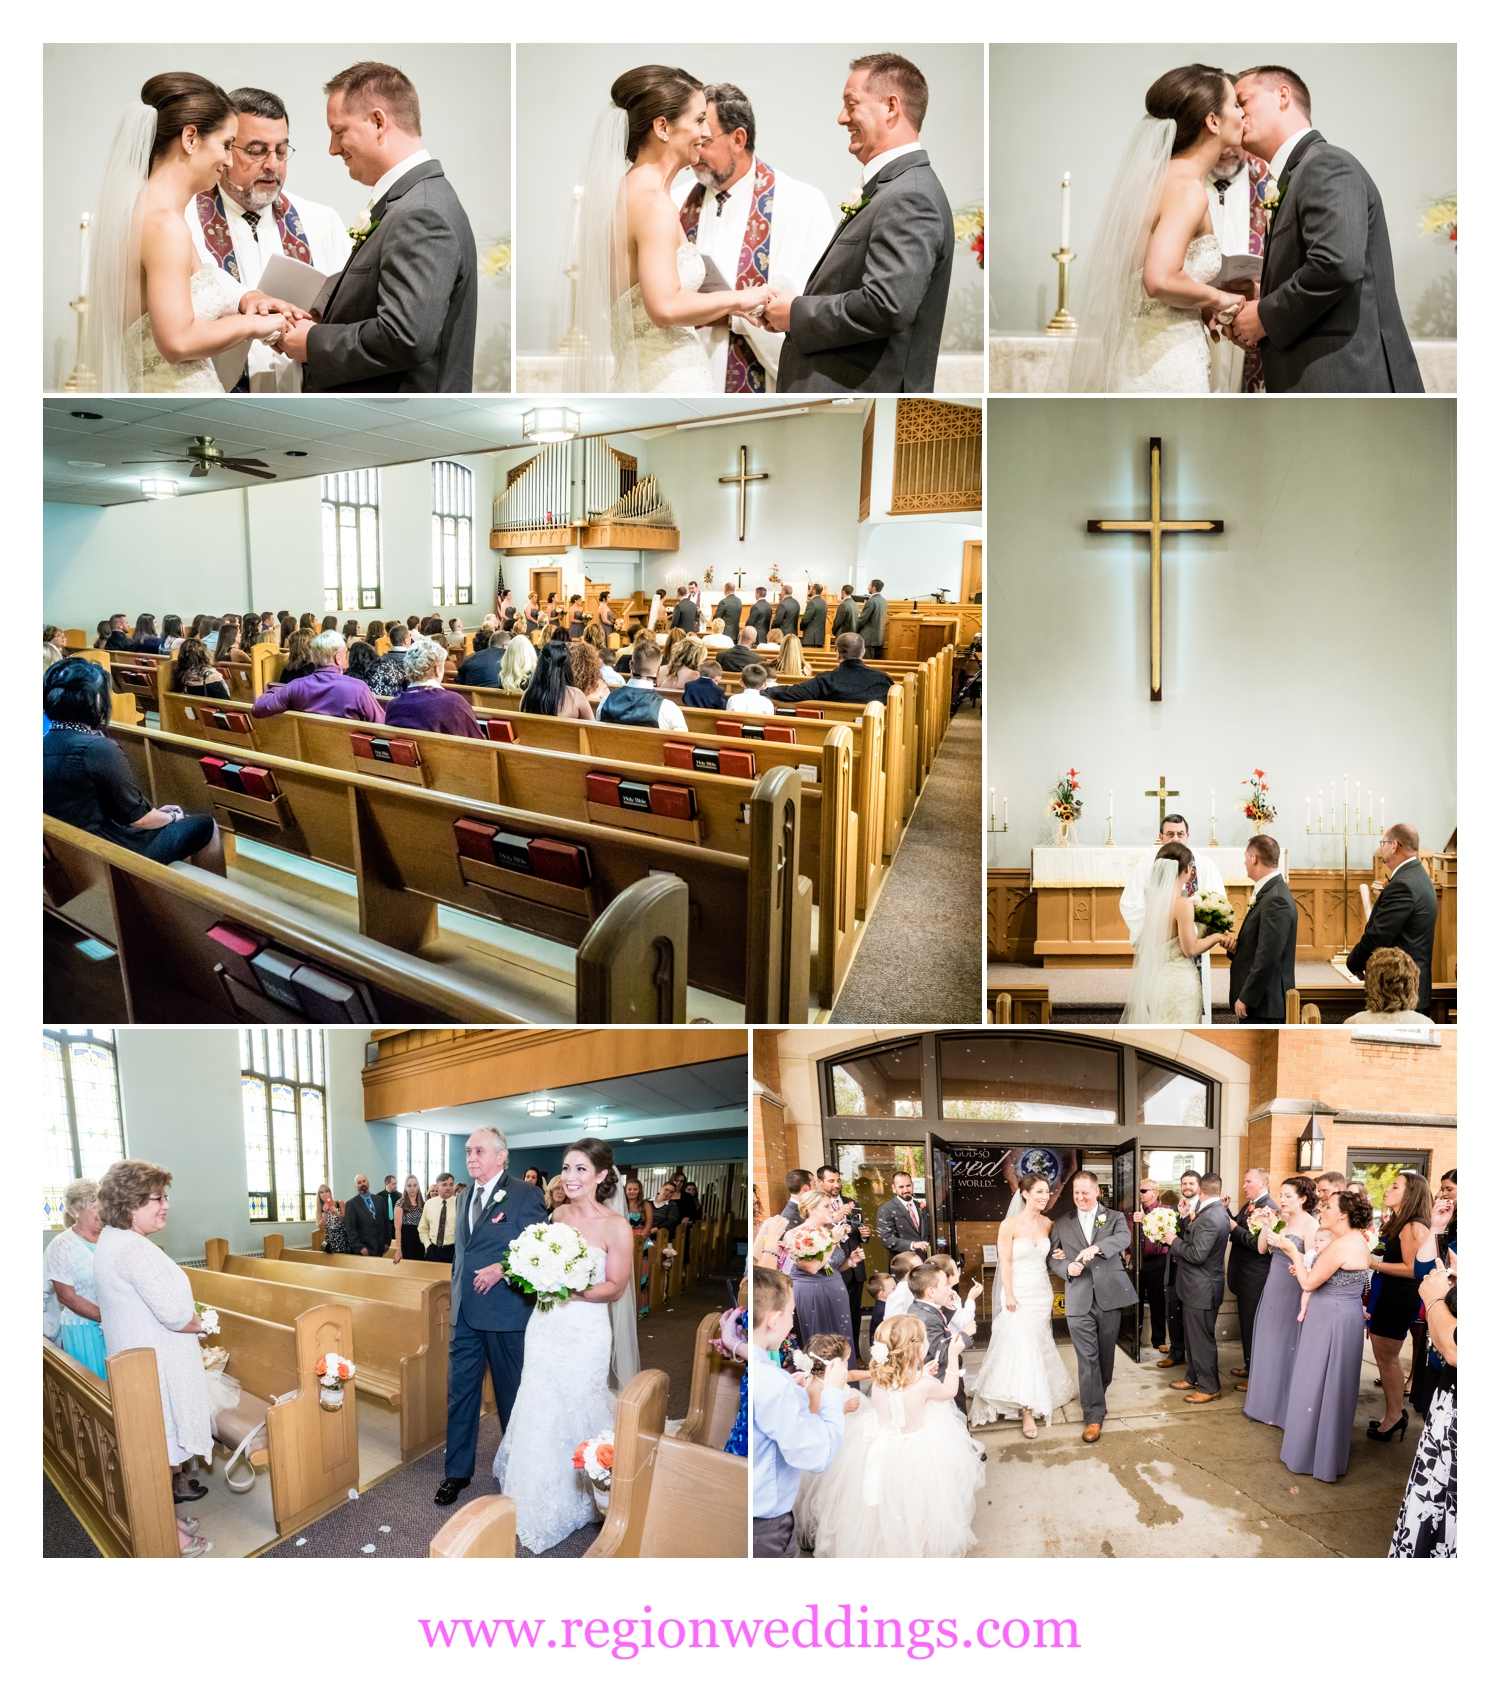 Wedding ceremony at Lowell United Methodist Church.